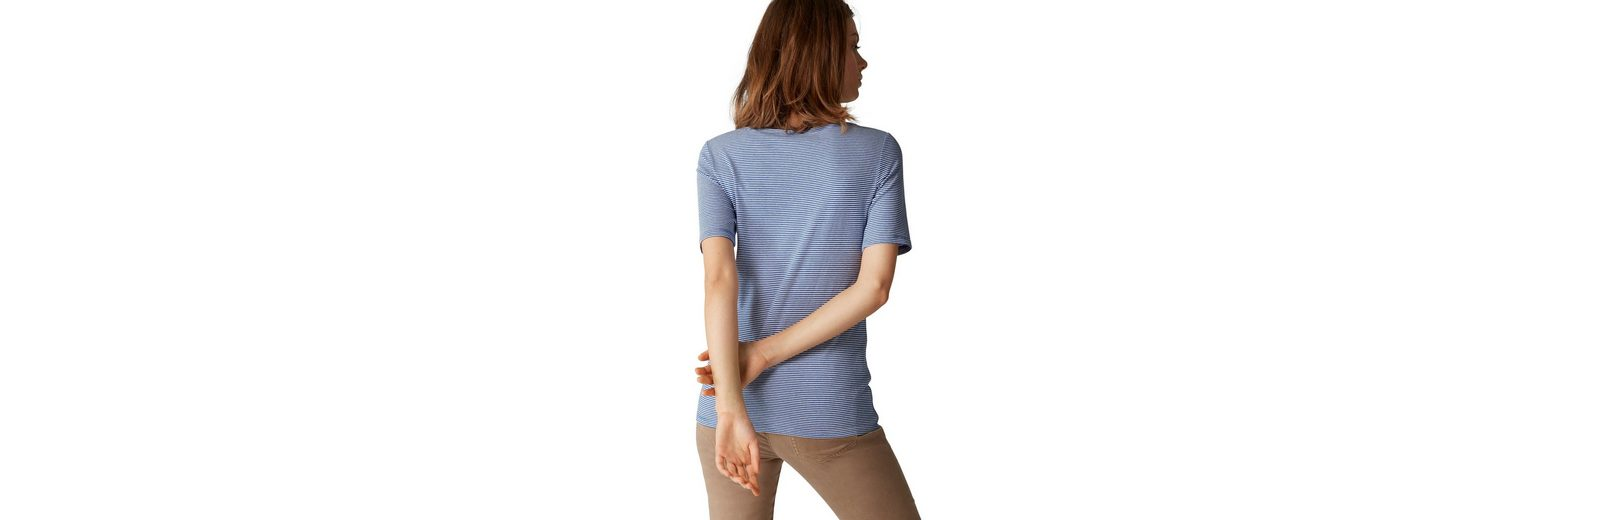 Marc O'Polo T-Shirt Bekommt Einen Rabatt Zu Kaufen Verkauf Online-Shopping Rabatt Aaa Billig Ausverkauf Store aRUApY